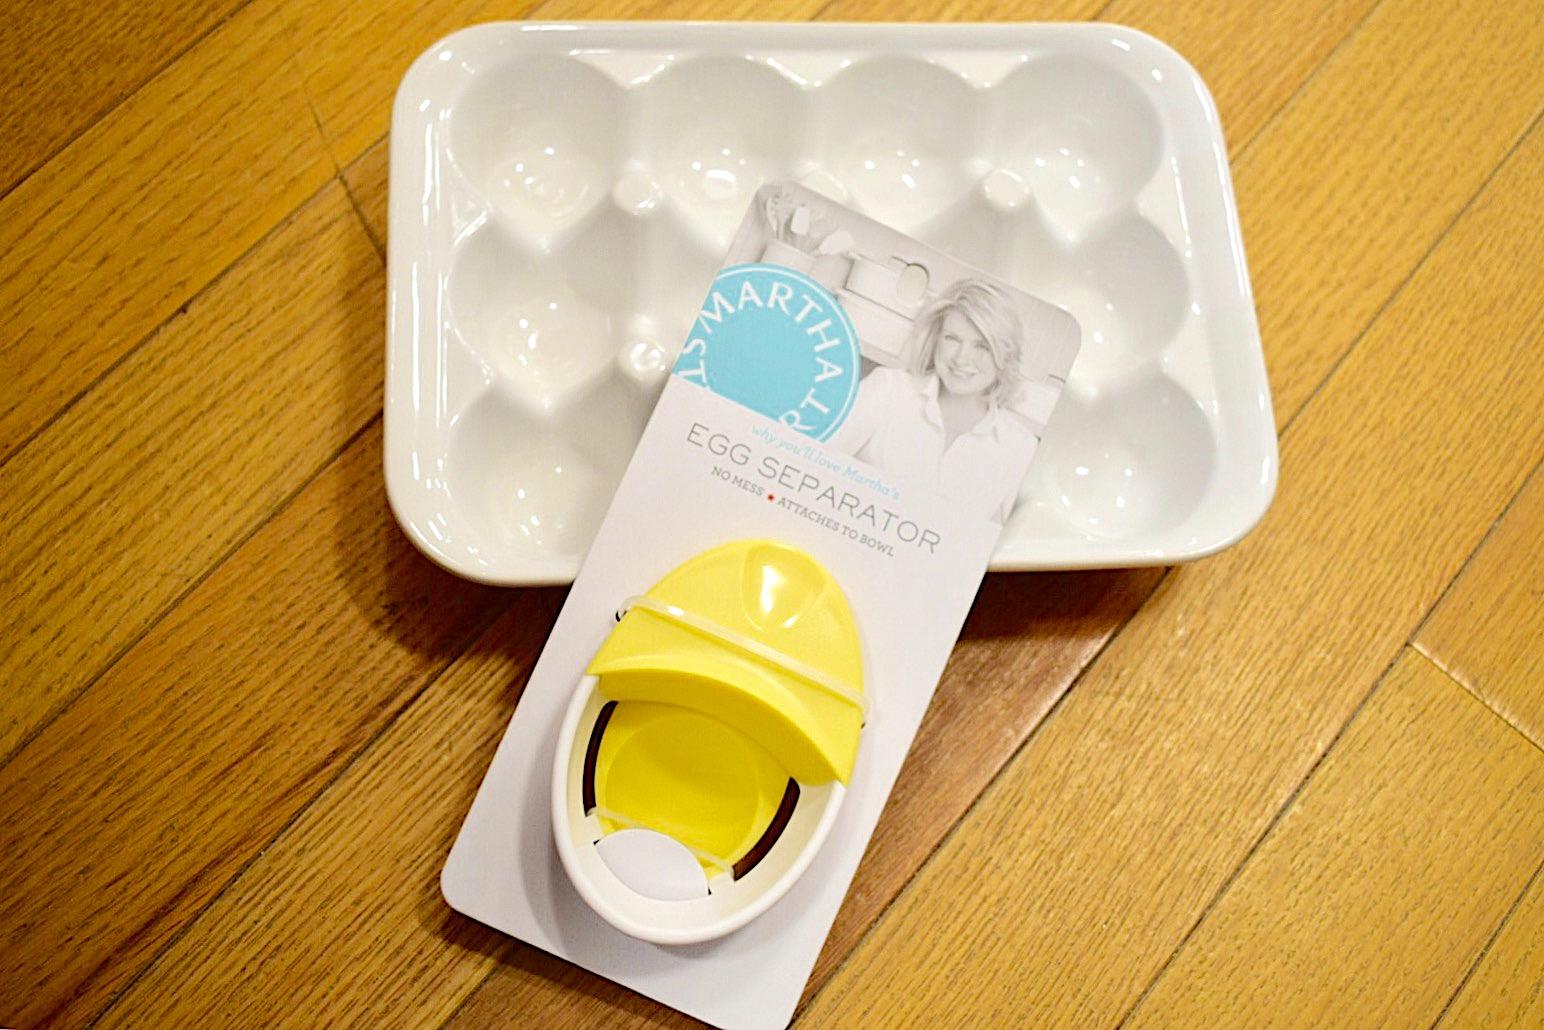 Martha Stewart Egg Separator with ceramic egg tray at Macys